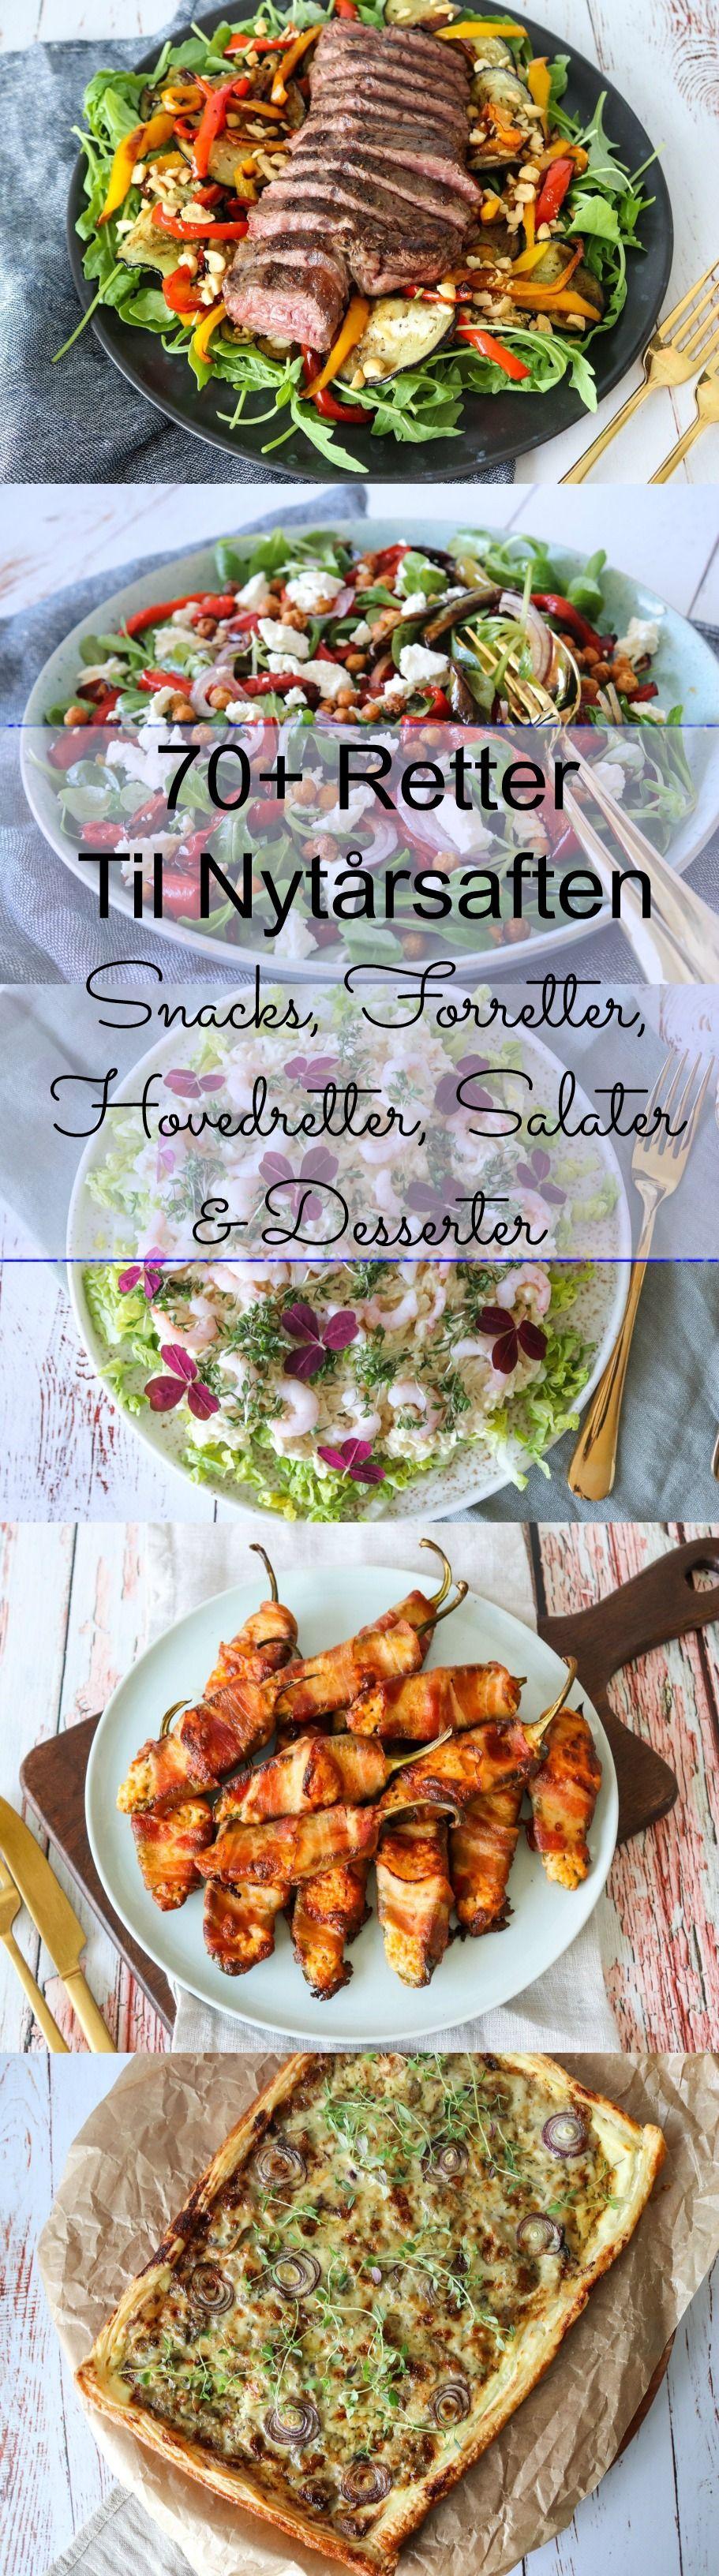 Mad Til Nytårsaften - Snacks, Forretter, Hovedretter, Salater Og Dessert #nytårdesserter